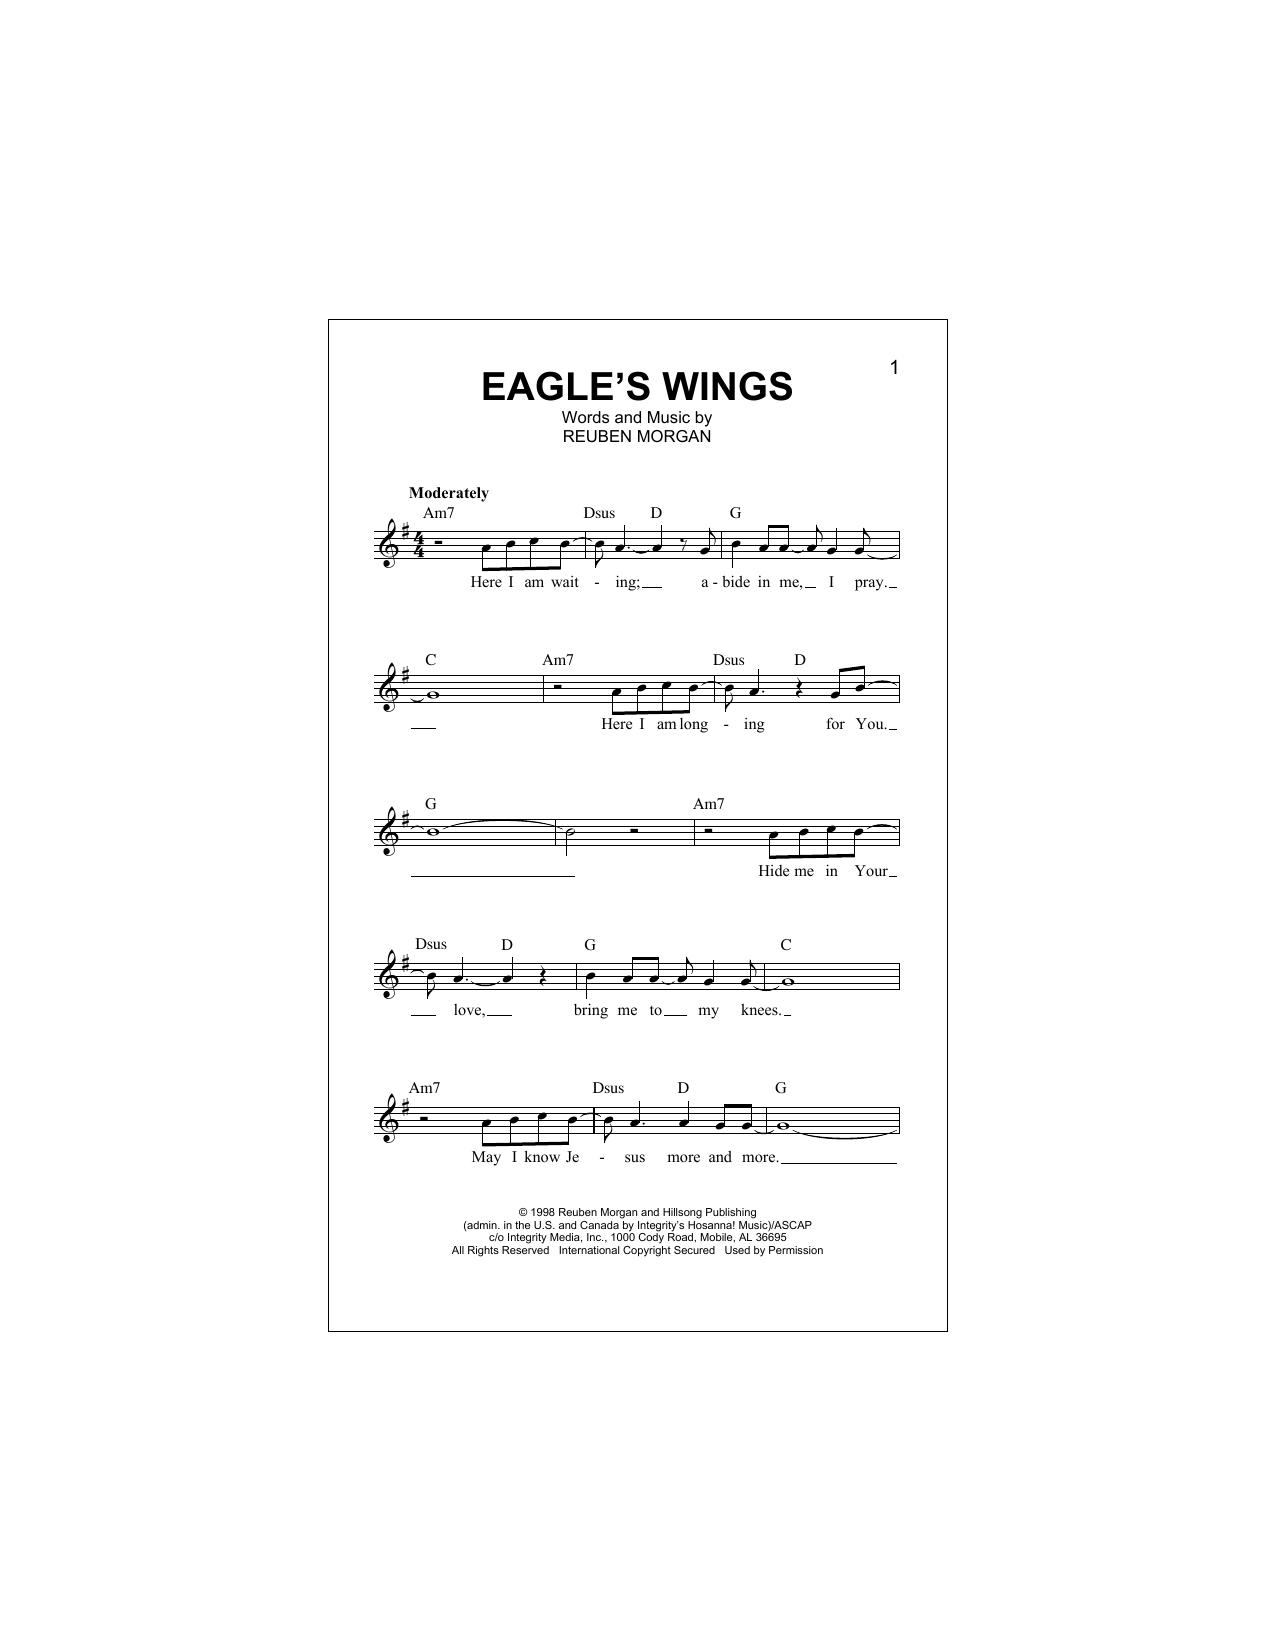 Sheet Music Digital Files To Print - Licensed Reuben Morgan